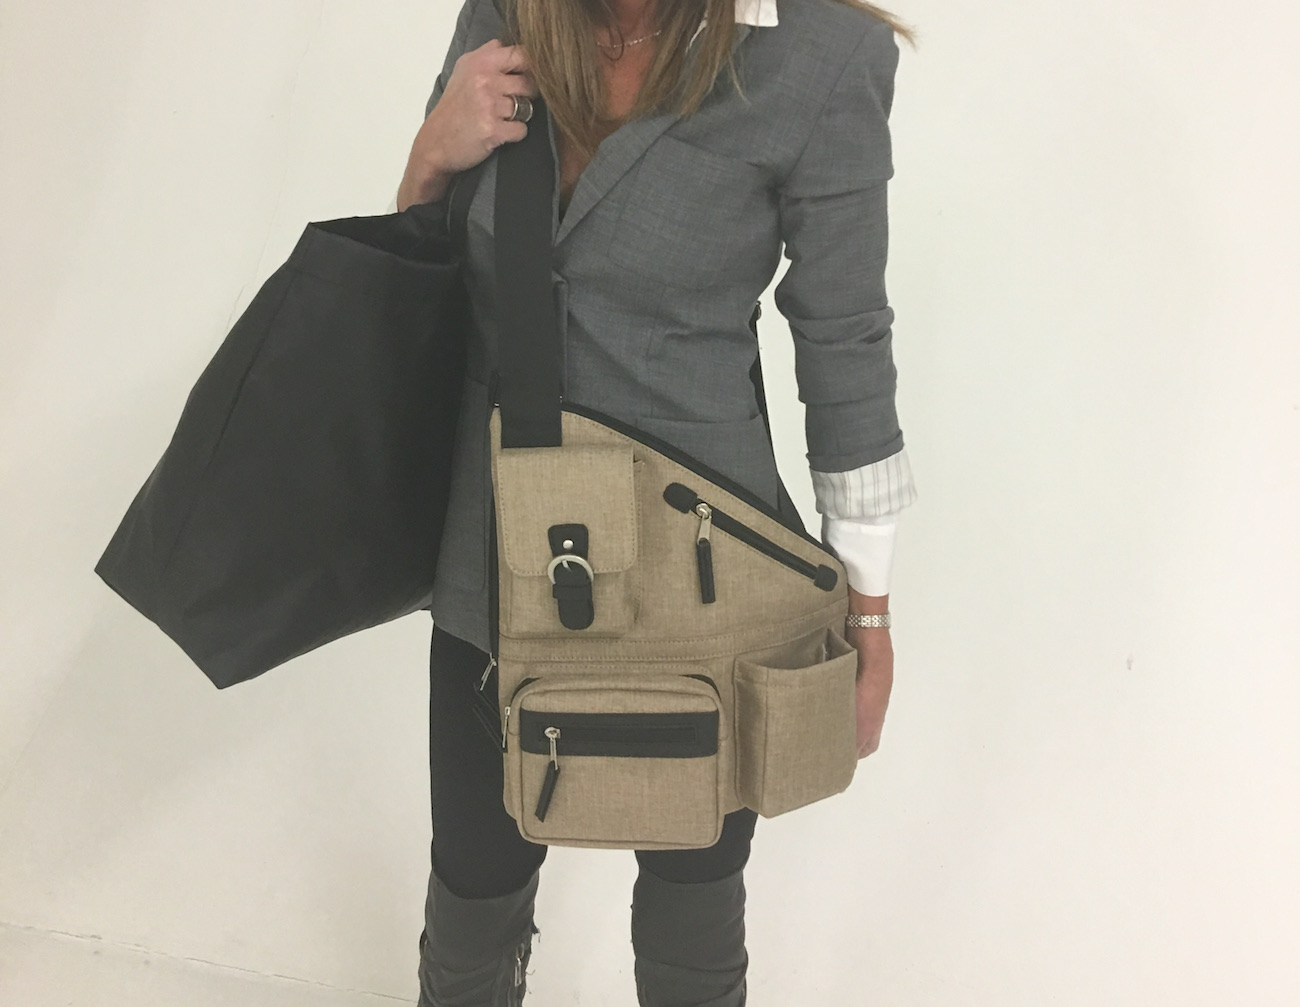 Metro Signature Crossbody Bag – RFID Credit Card Sleeve and Durable Strap